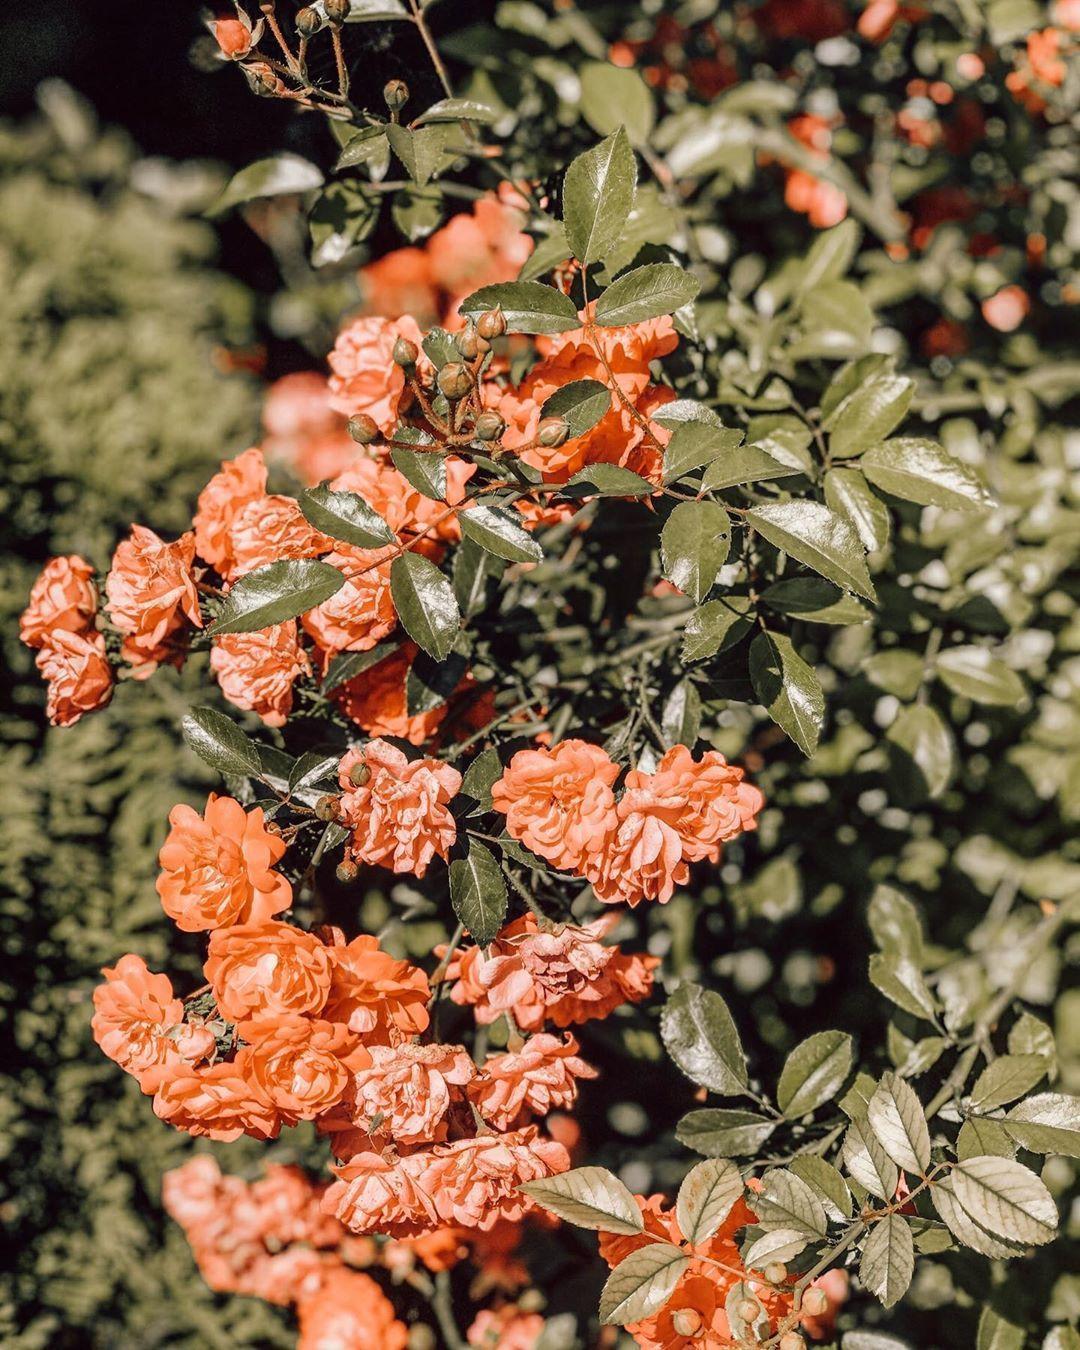 ☼ 𝐇𝐚𝐩𝐩𝐲 𝐓𝐡𝐮𝐫𝐬𝐝𝐚𝐲 ☼ . . . #goodmorning #goodmorningworld #gutenmorgen #gutenmorgenwelt #happyday #happythursday #happyday #enjoythelittlethings #moodforfloral #seeingthepretty #allthingsbotanical #blooms #flowers #flowergram #flowerlover #flowerphotography #flowerphotos #flowersofinstagram #nature #naturephoto #botanicalpickmeup #plantfocus #plantlove #plantstagram #greenery #plants #igers #igersaustria